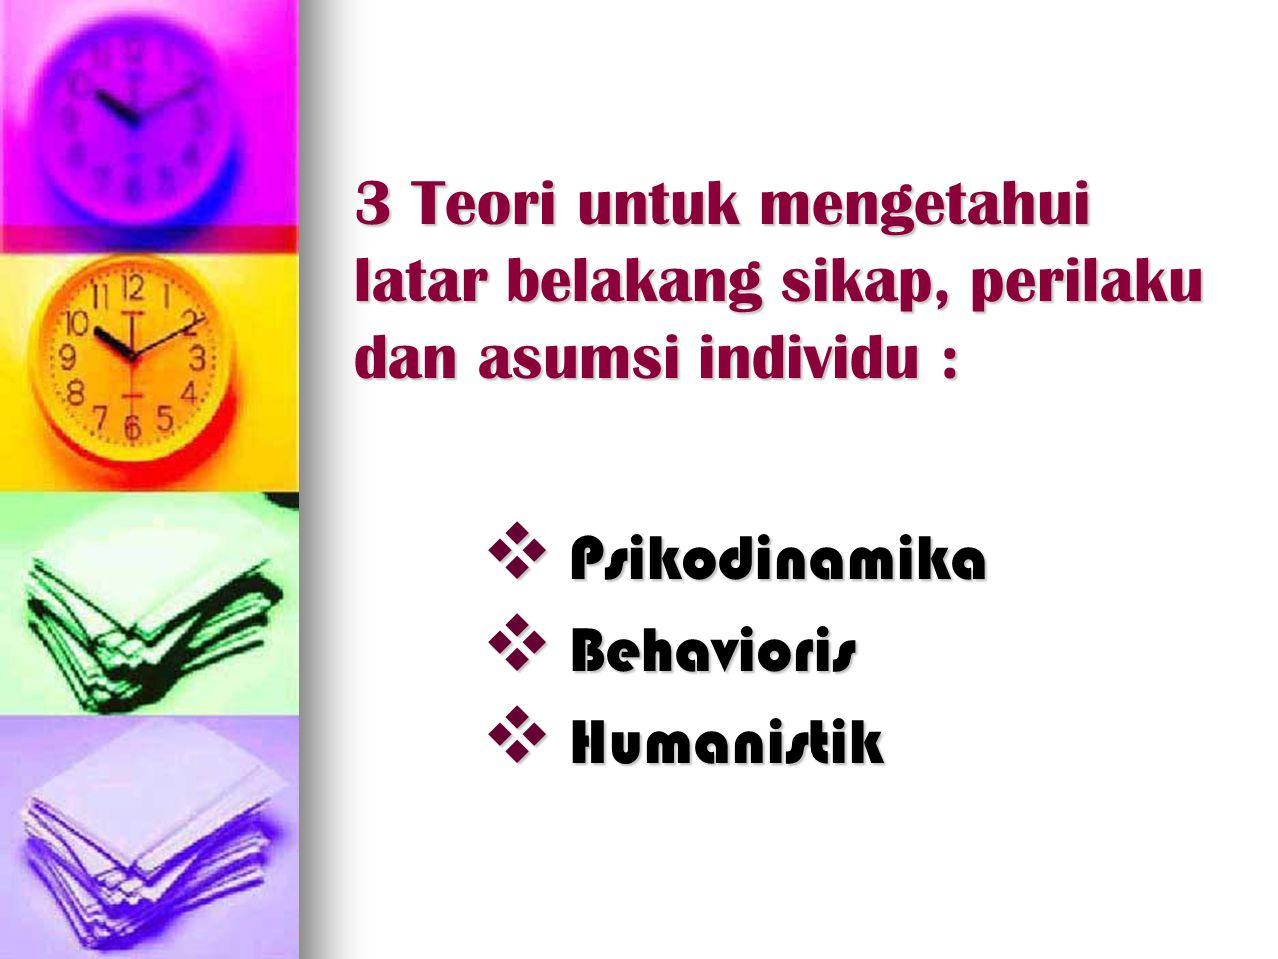 3 Teori untuk mengetahui latar belakang sikap, perilaku dan asumsi individu :  Psikodinamika  Behavioris  Humanistik